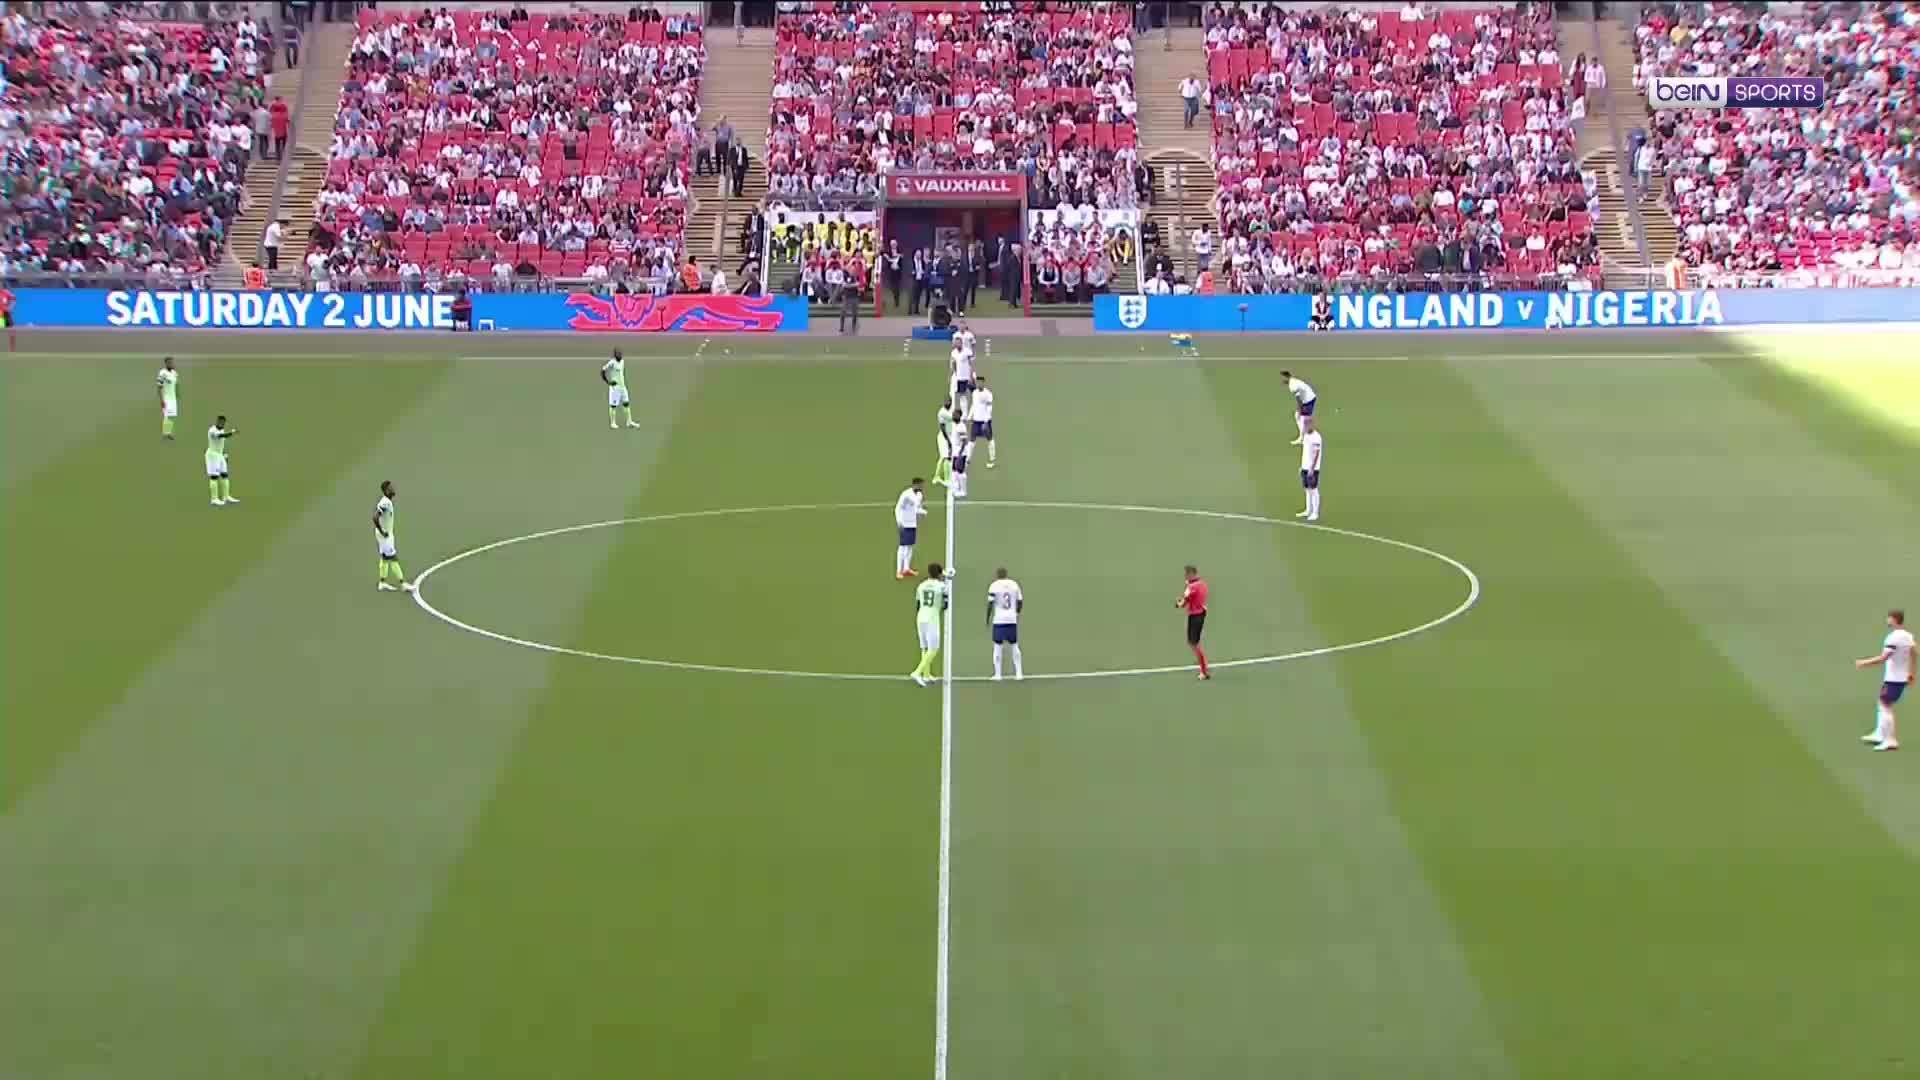 Anh 2-1 Nigeria